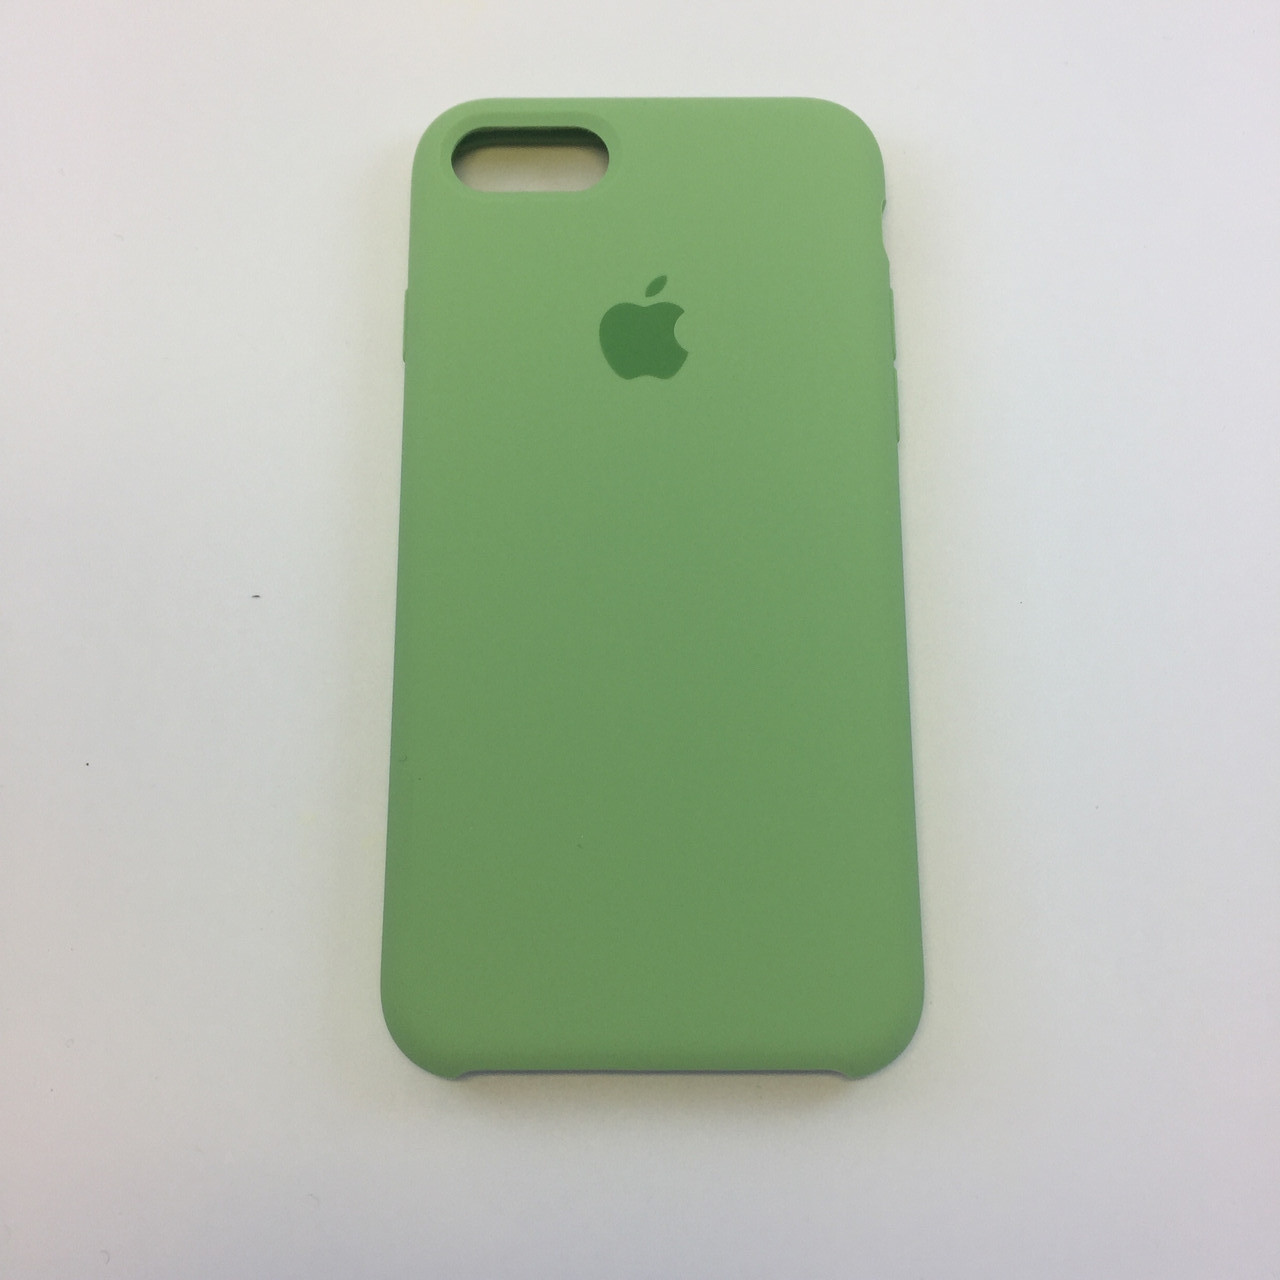 Силиконовый чехол OEM Silicon Case для iPhone 7 Plus / 8 Plus, фисташка